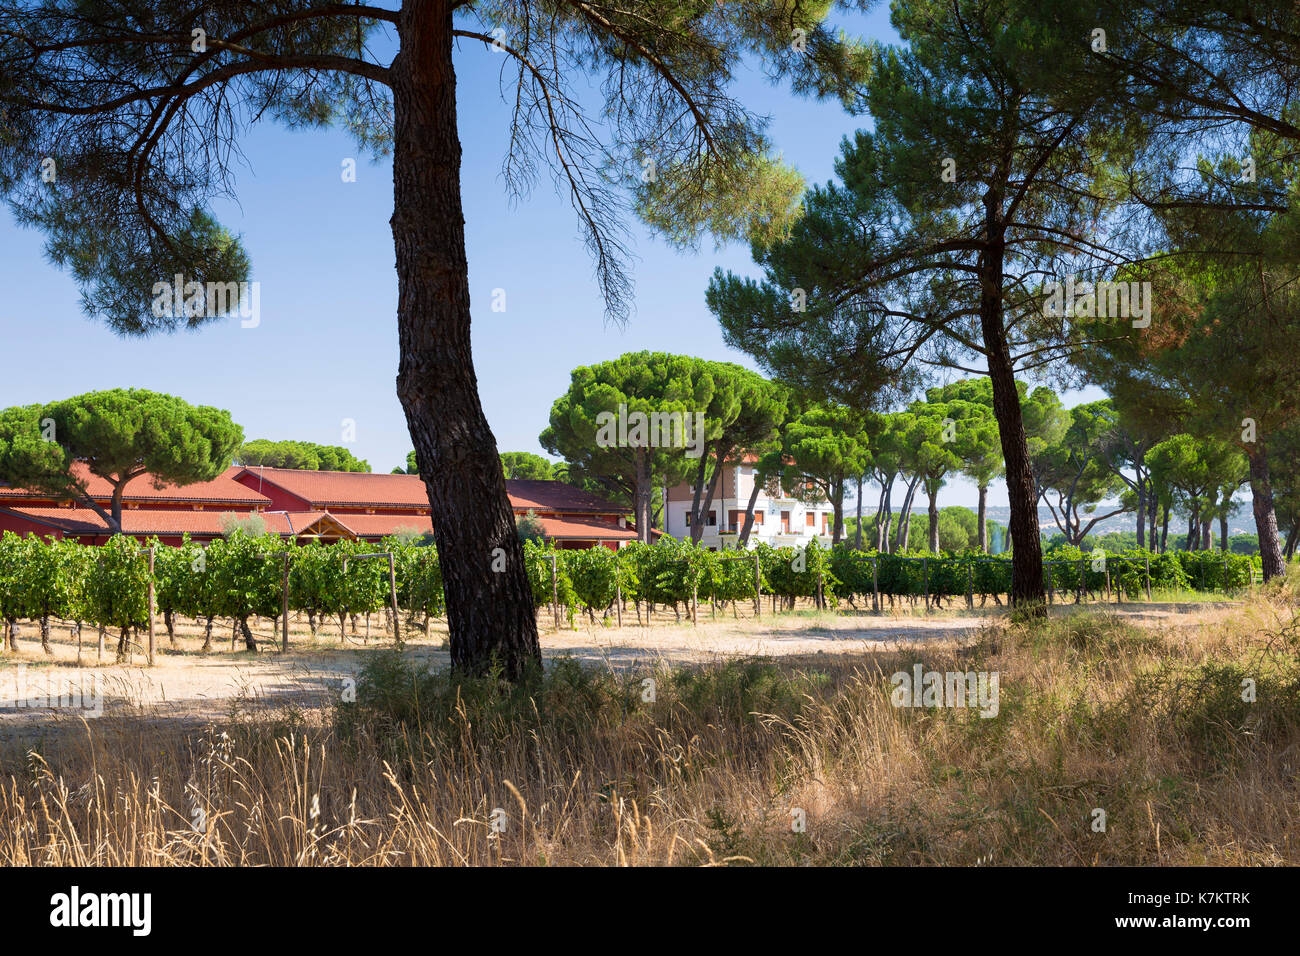 Finca Villacreces, Ribera del Duero wine production bodega by River Duero, Navarro, Spain Stock Photo